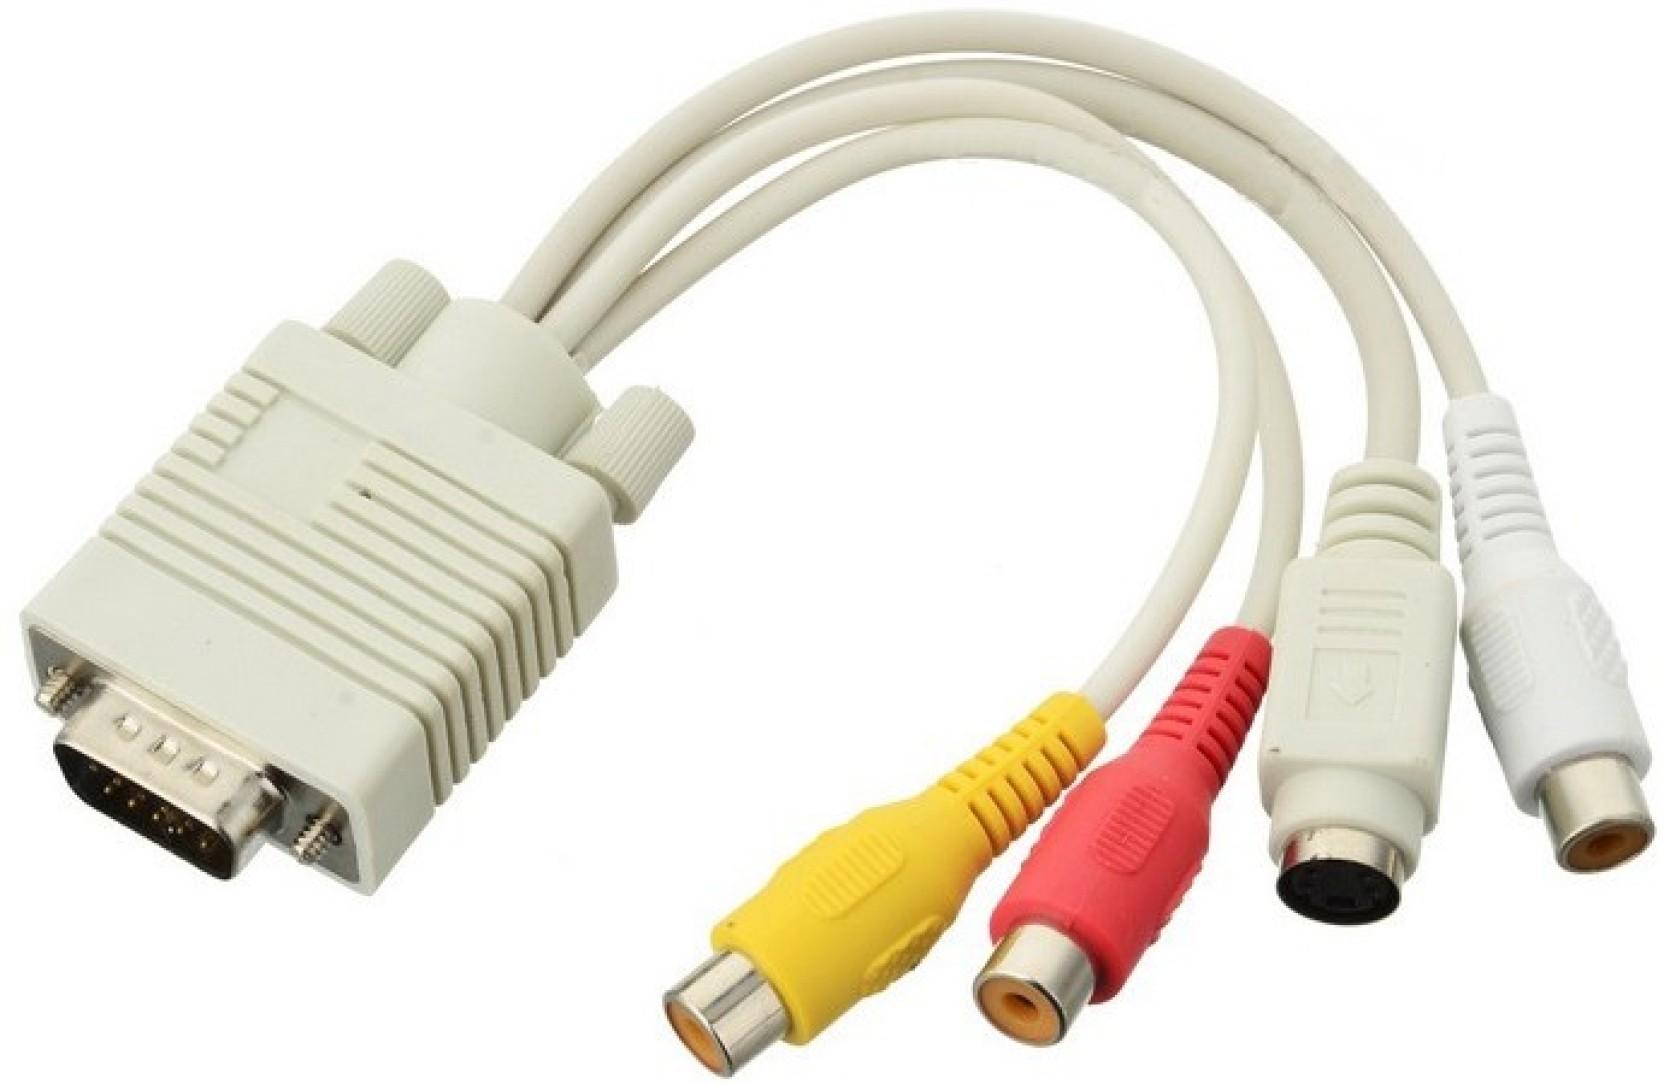 De Techinn Vga Male To S Video Cable Av Tv Adapter Converter For Pc Schematic Home